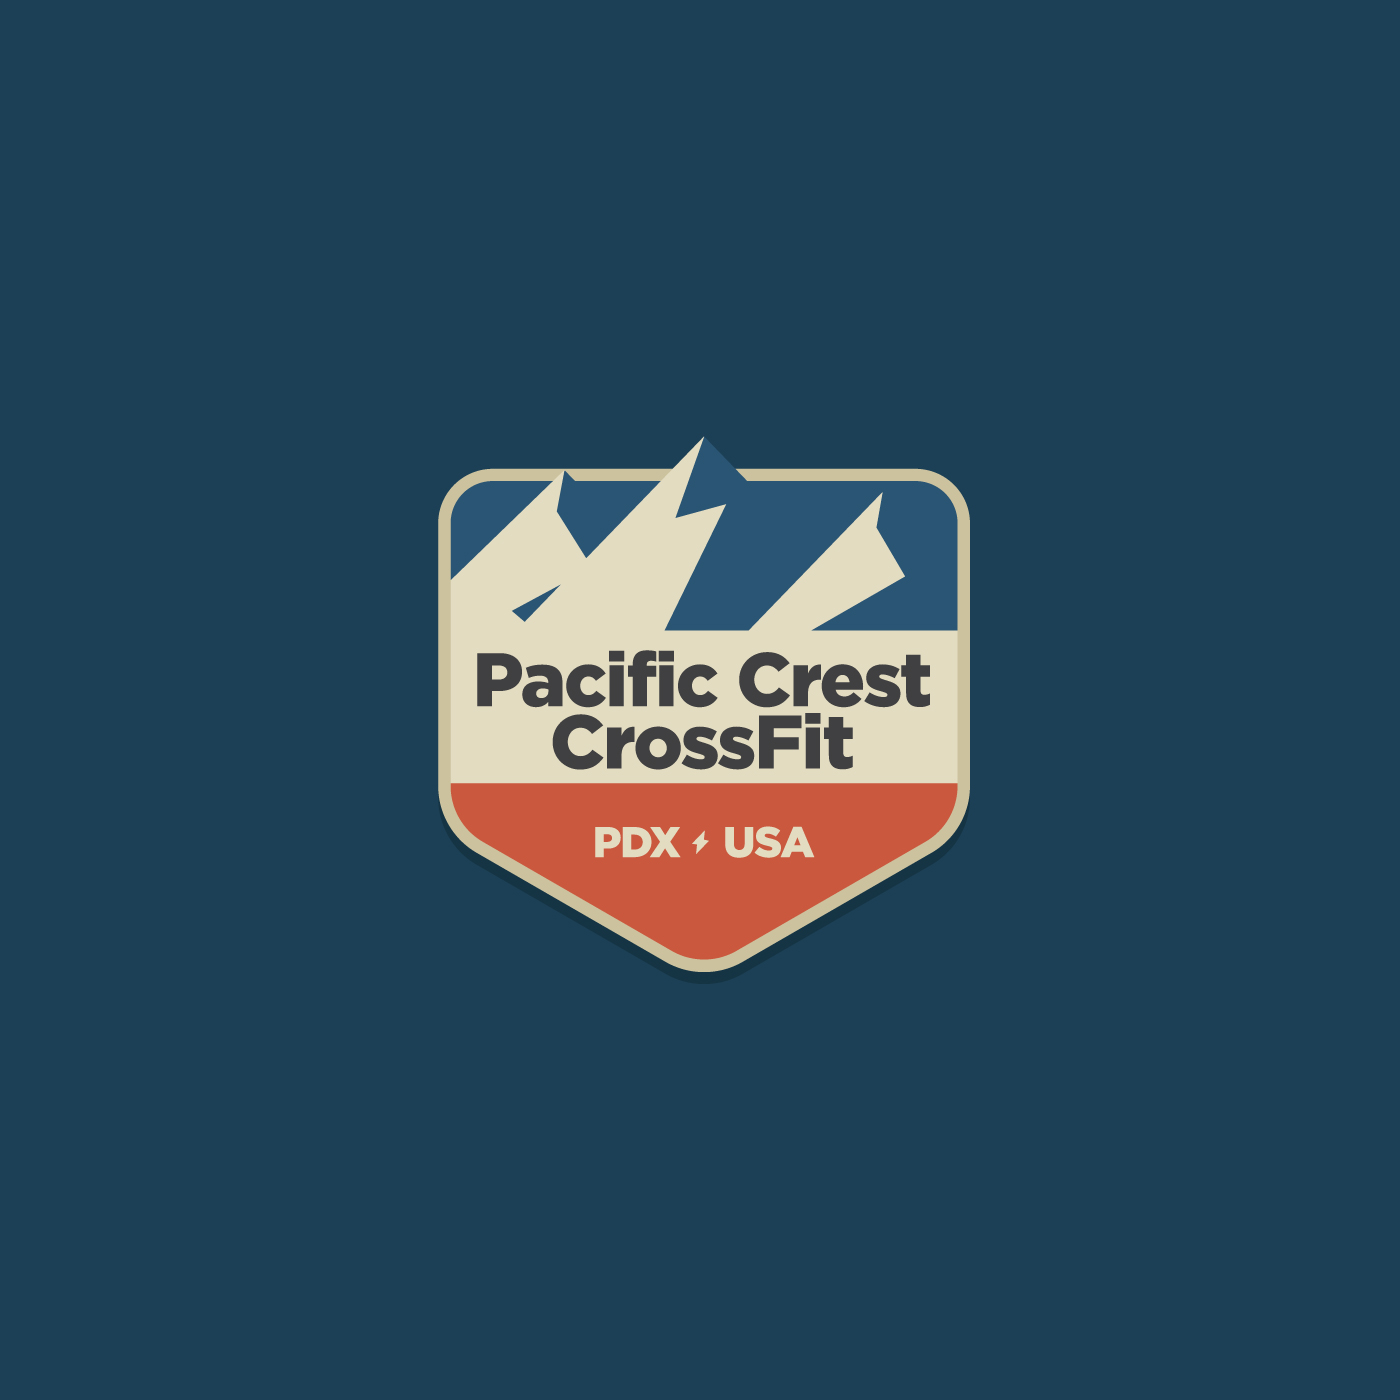 MQ49-pacificcrestcrossfit.jpg